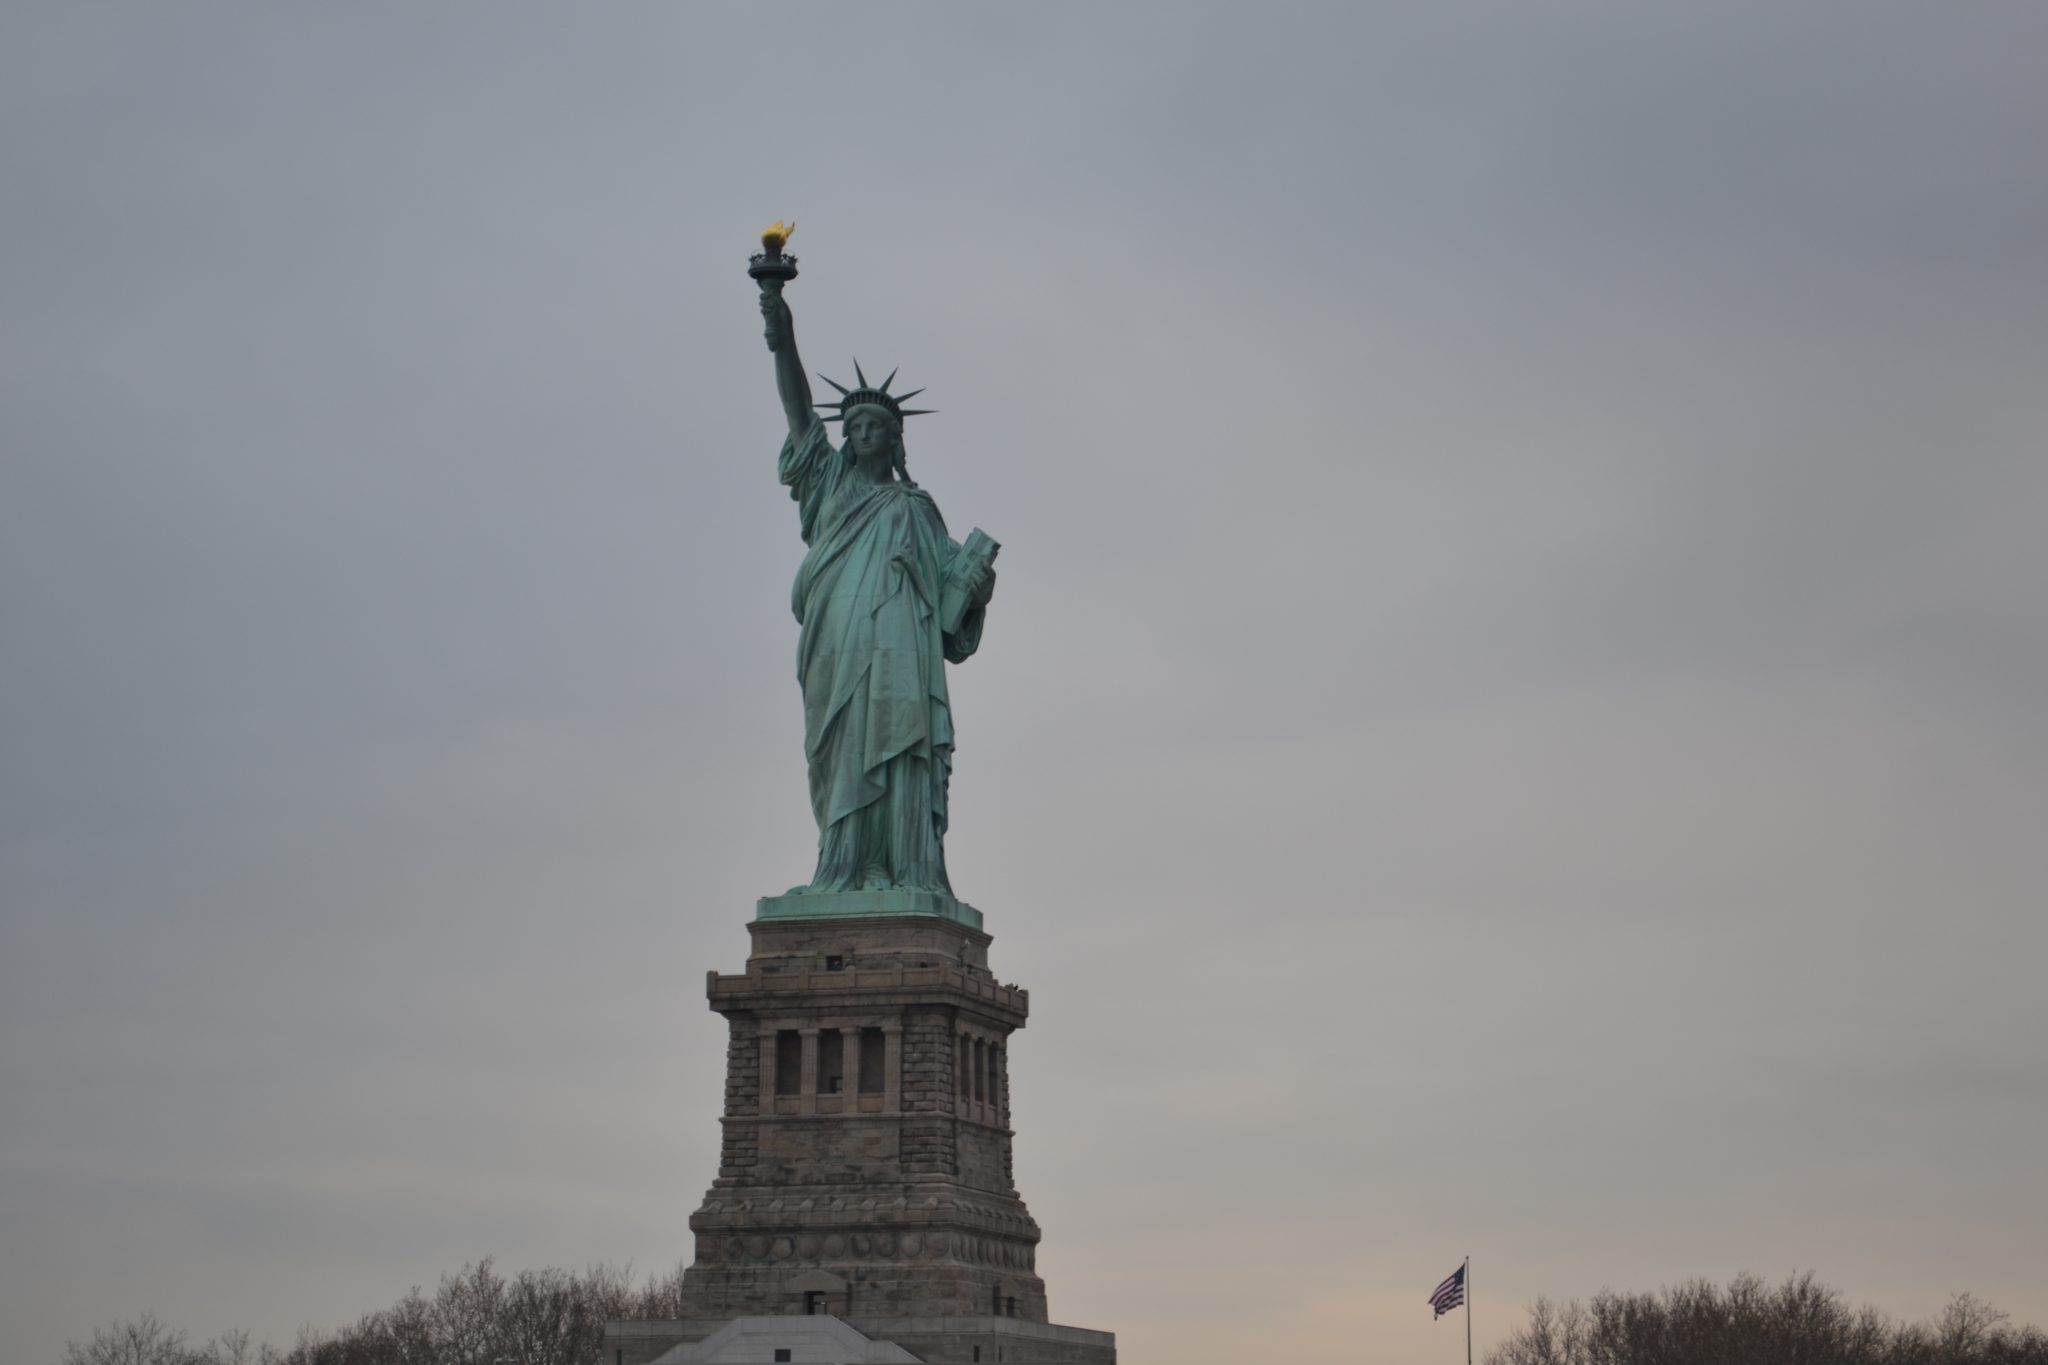 New York Part 4: Ellis Island & Statue of Liberty - dsc 0420